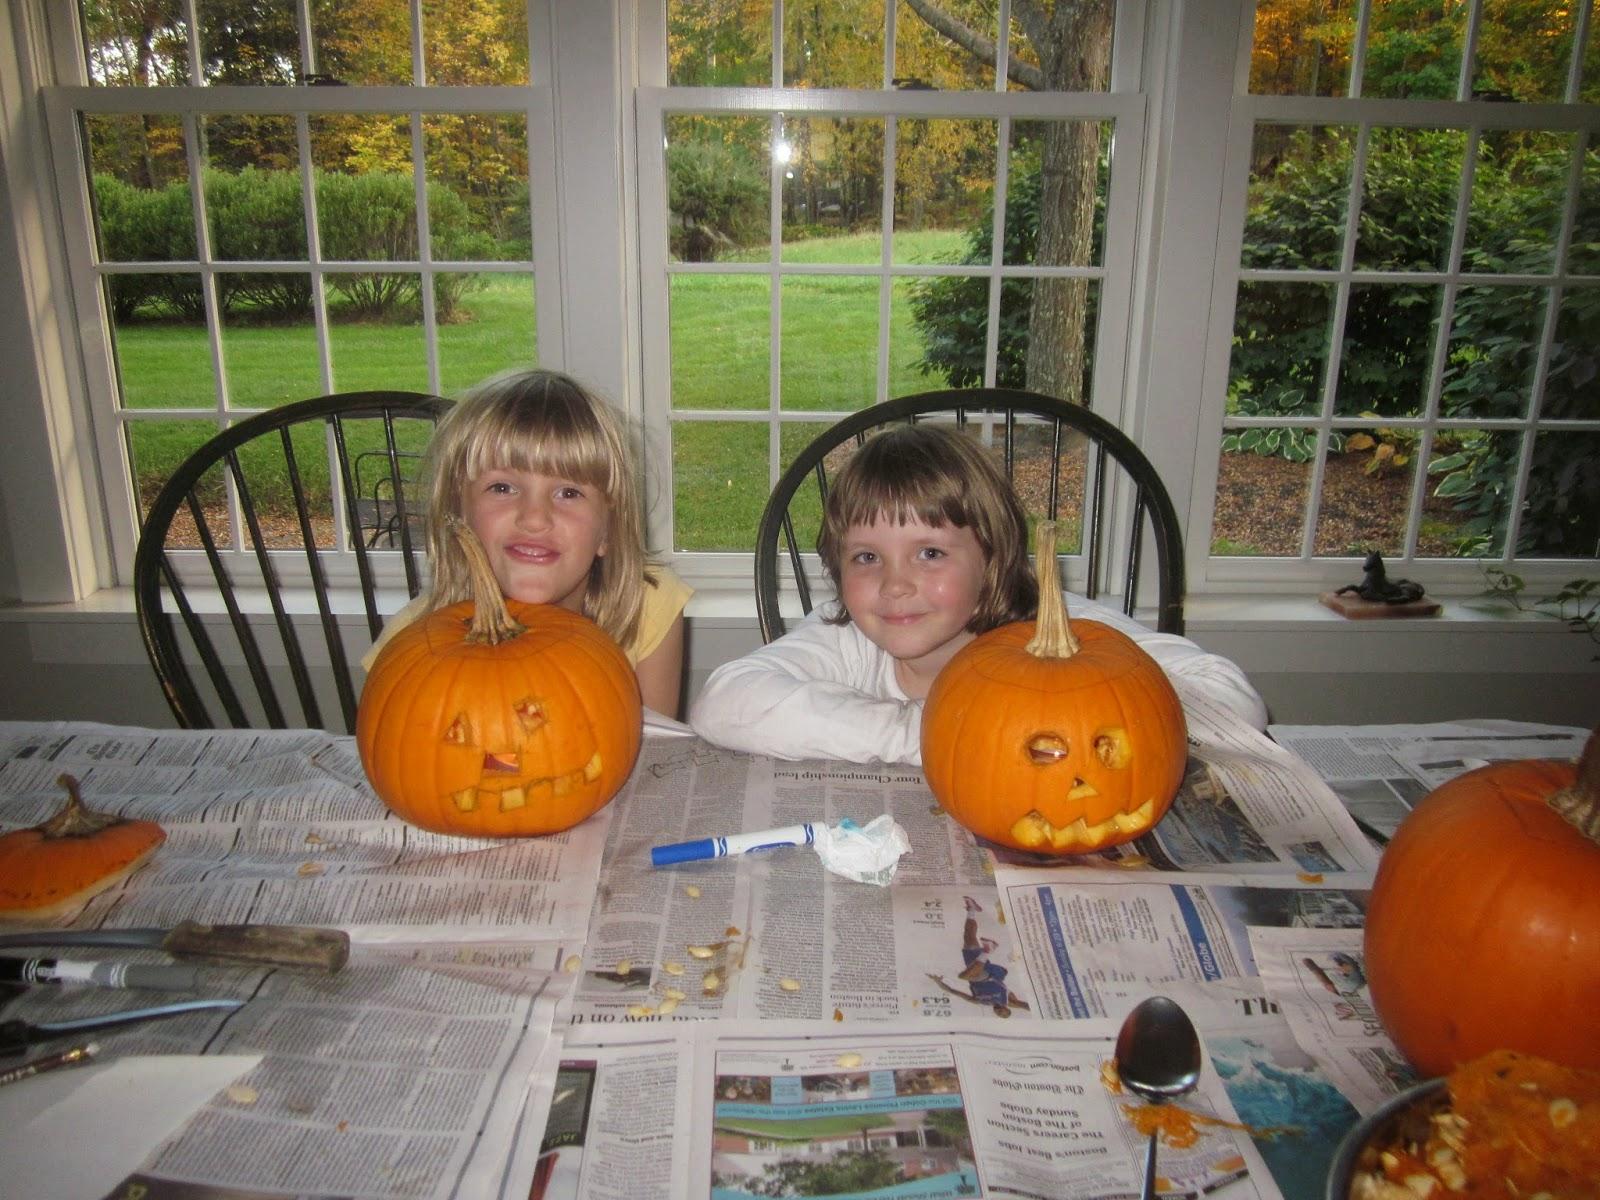 carving pumpkins at home